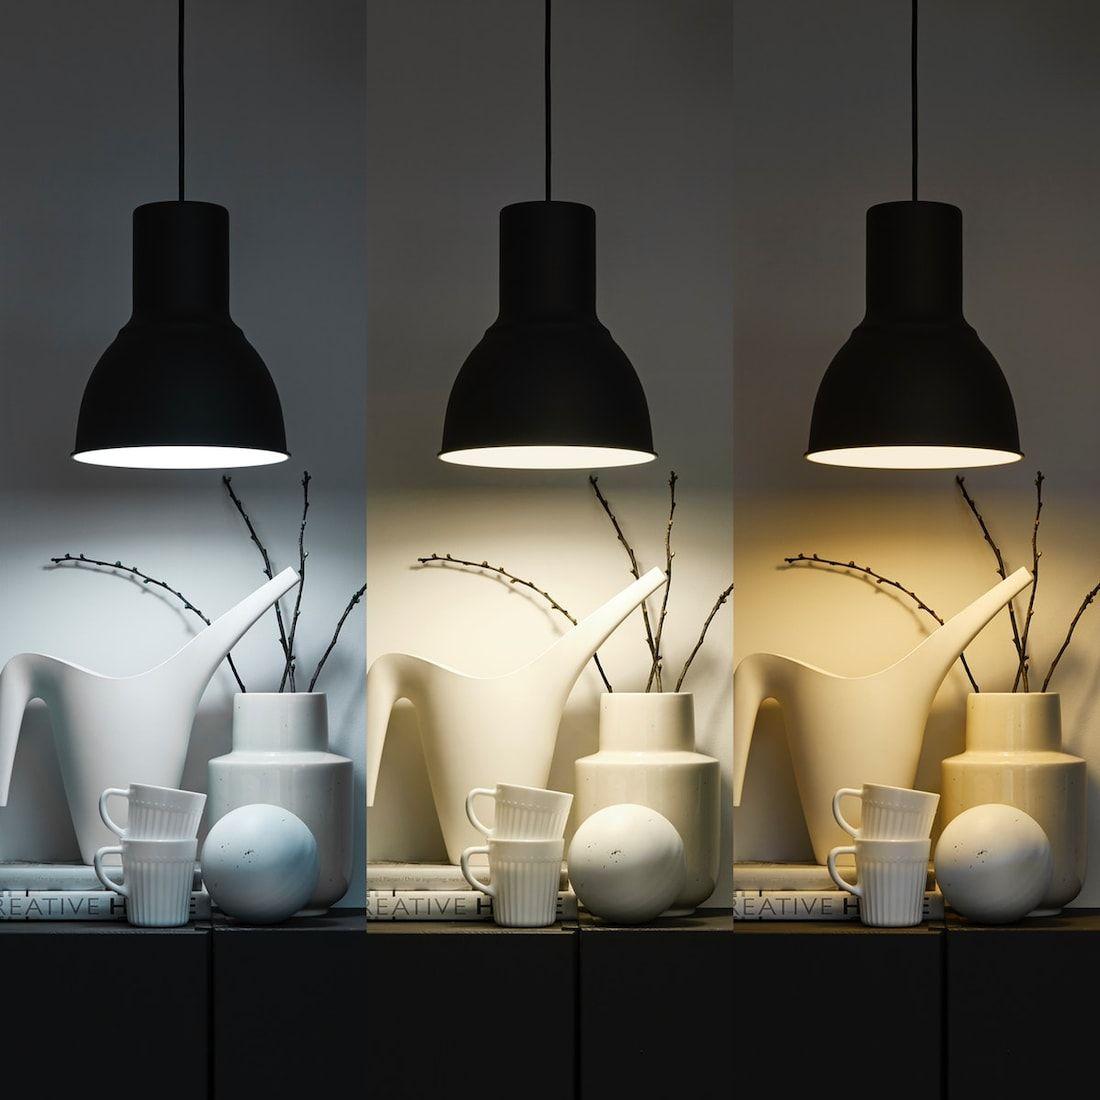 Tradfri Ikea Home Smart Beleuchtung In 2020 Leuchtmittel E27 Led Leuchtmittel Leuchtmittel